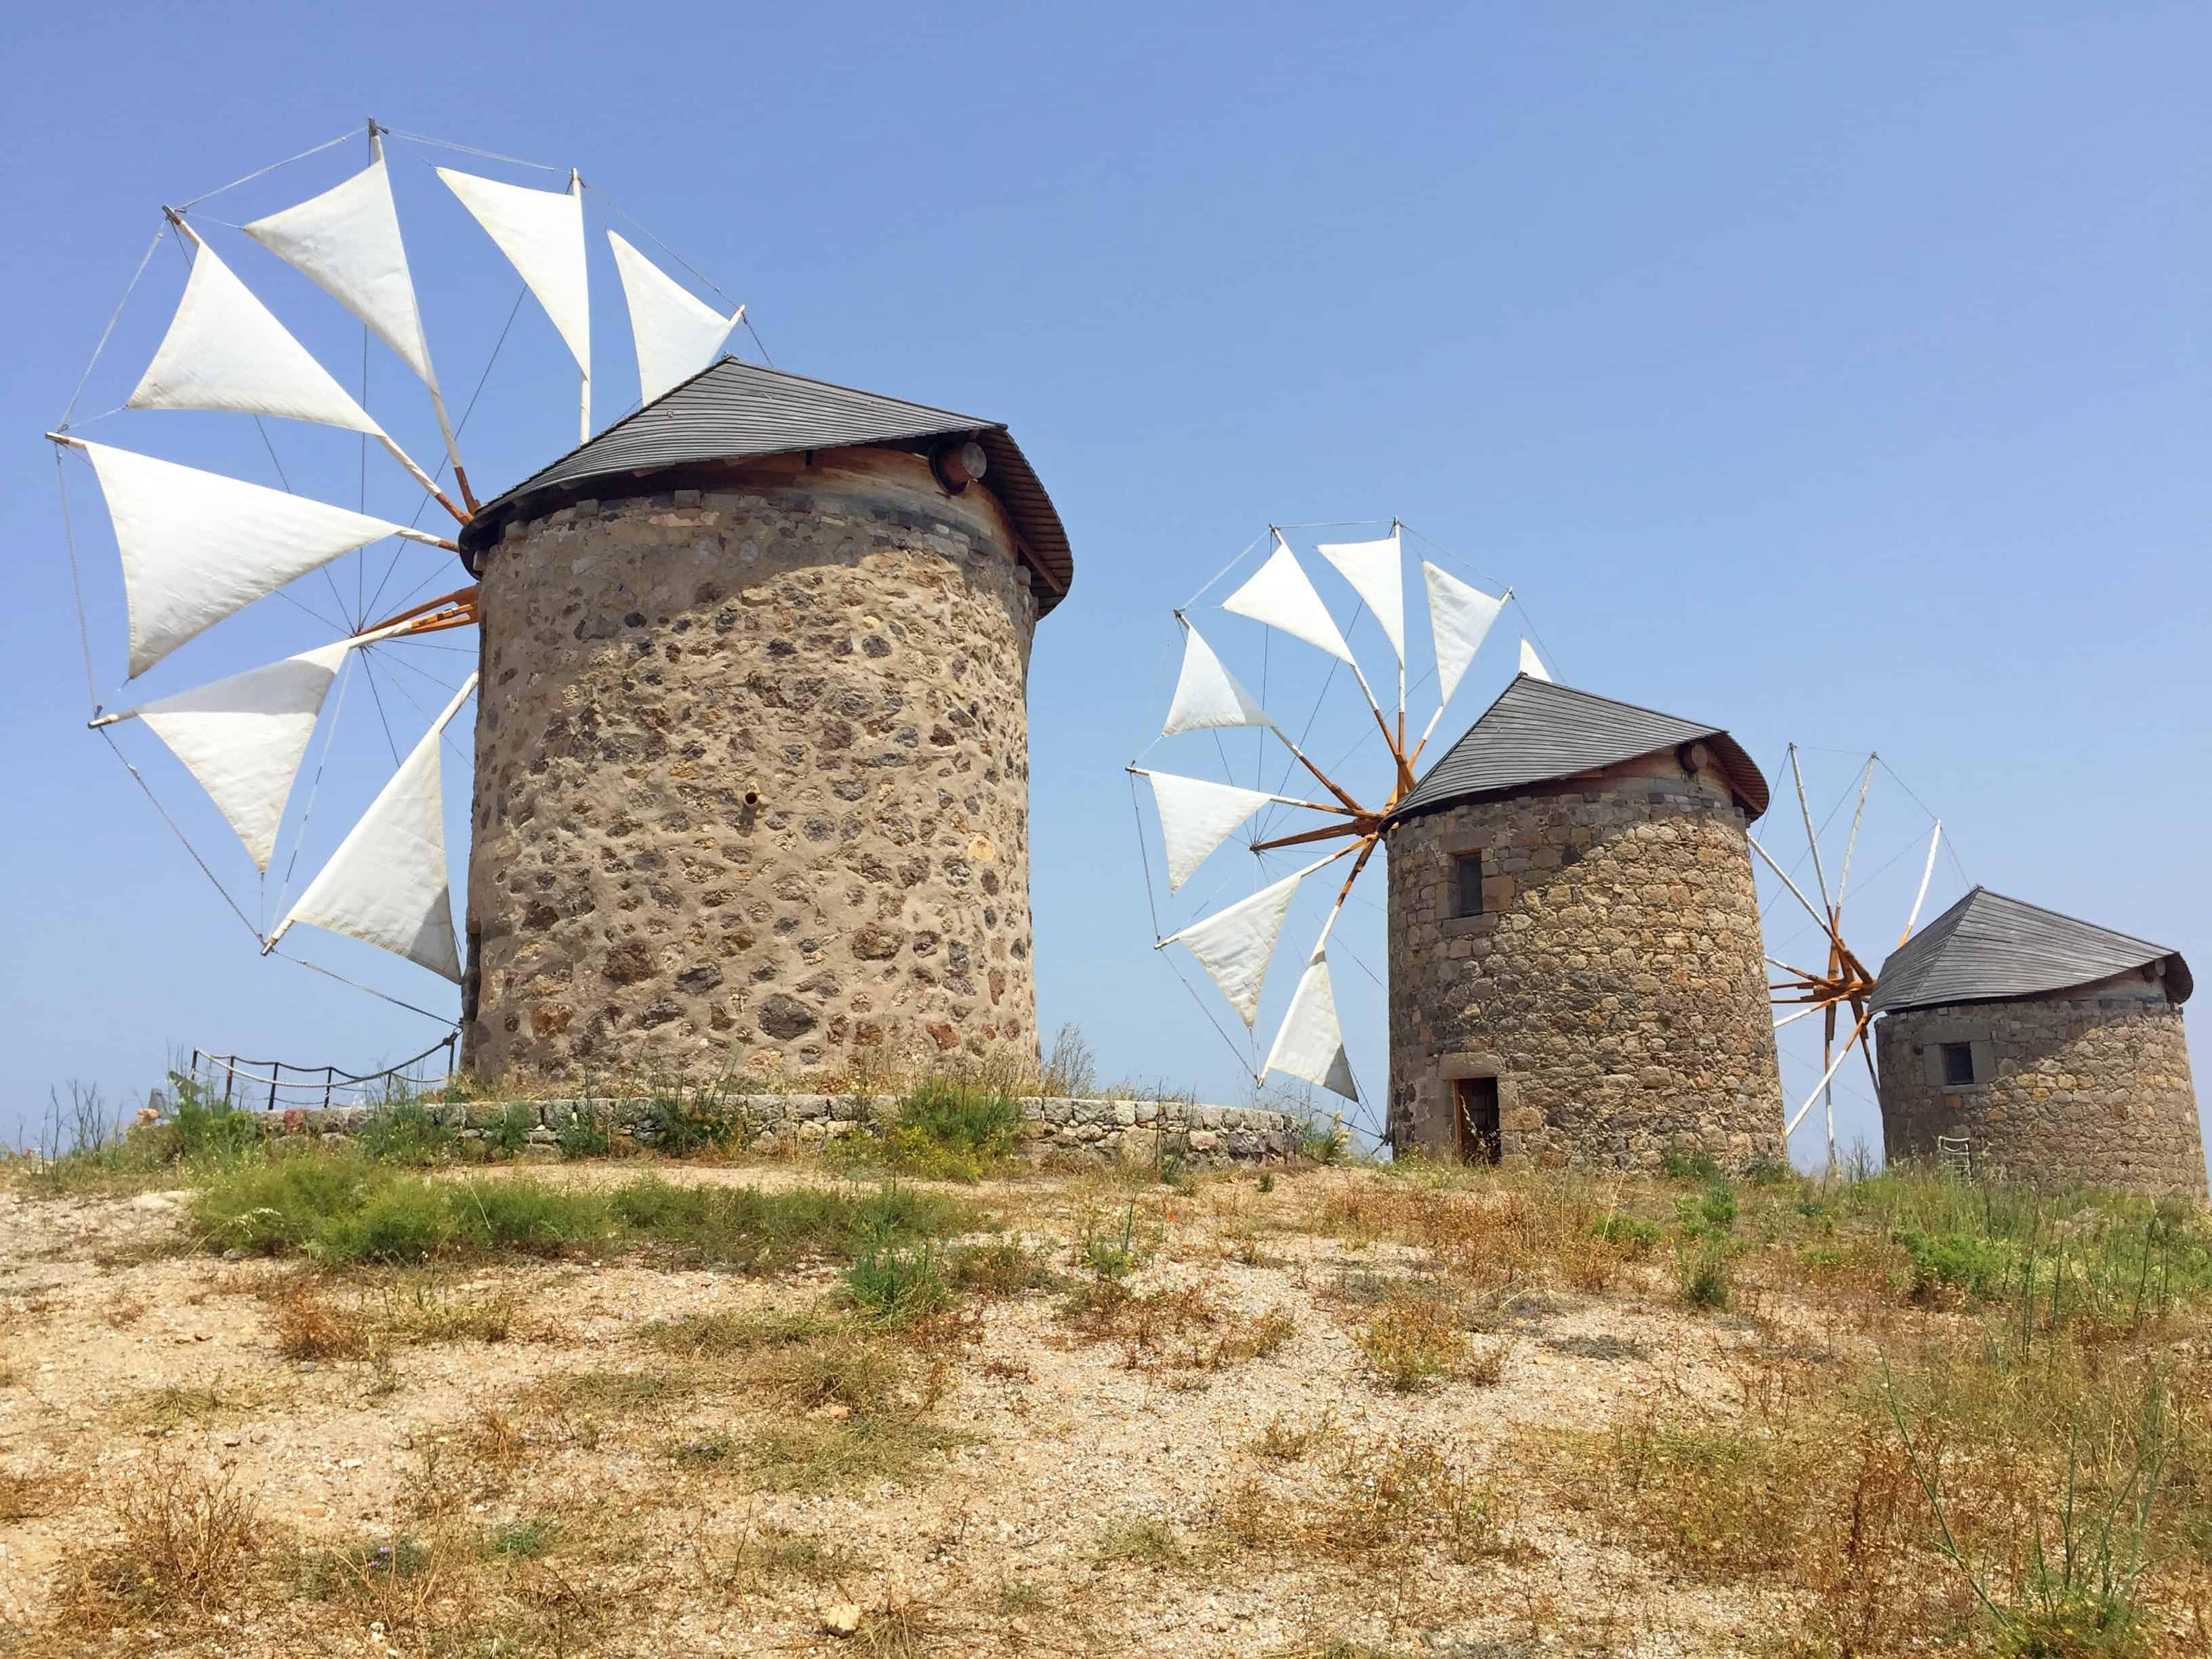 De molens bij Hora